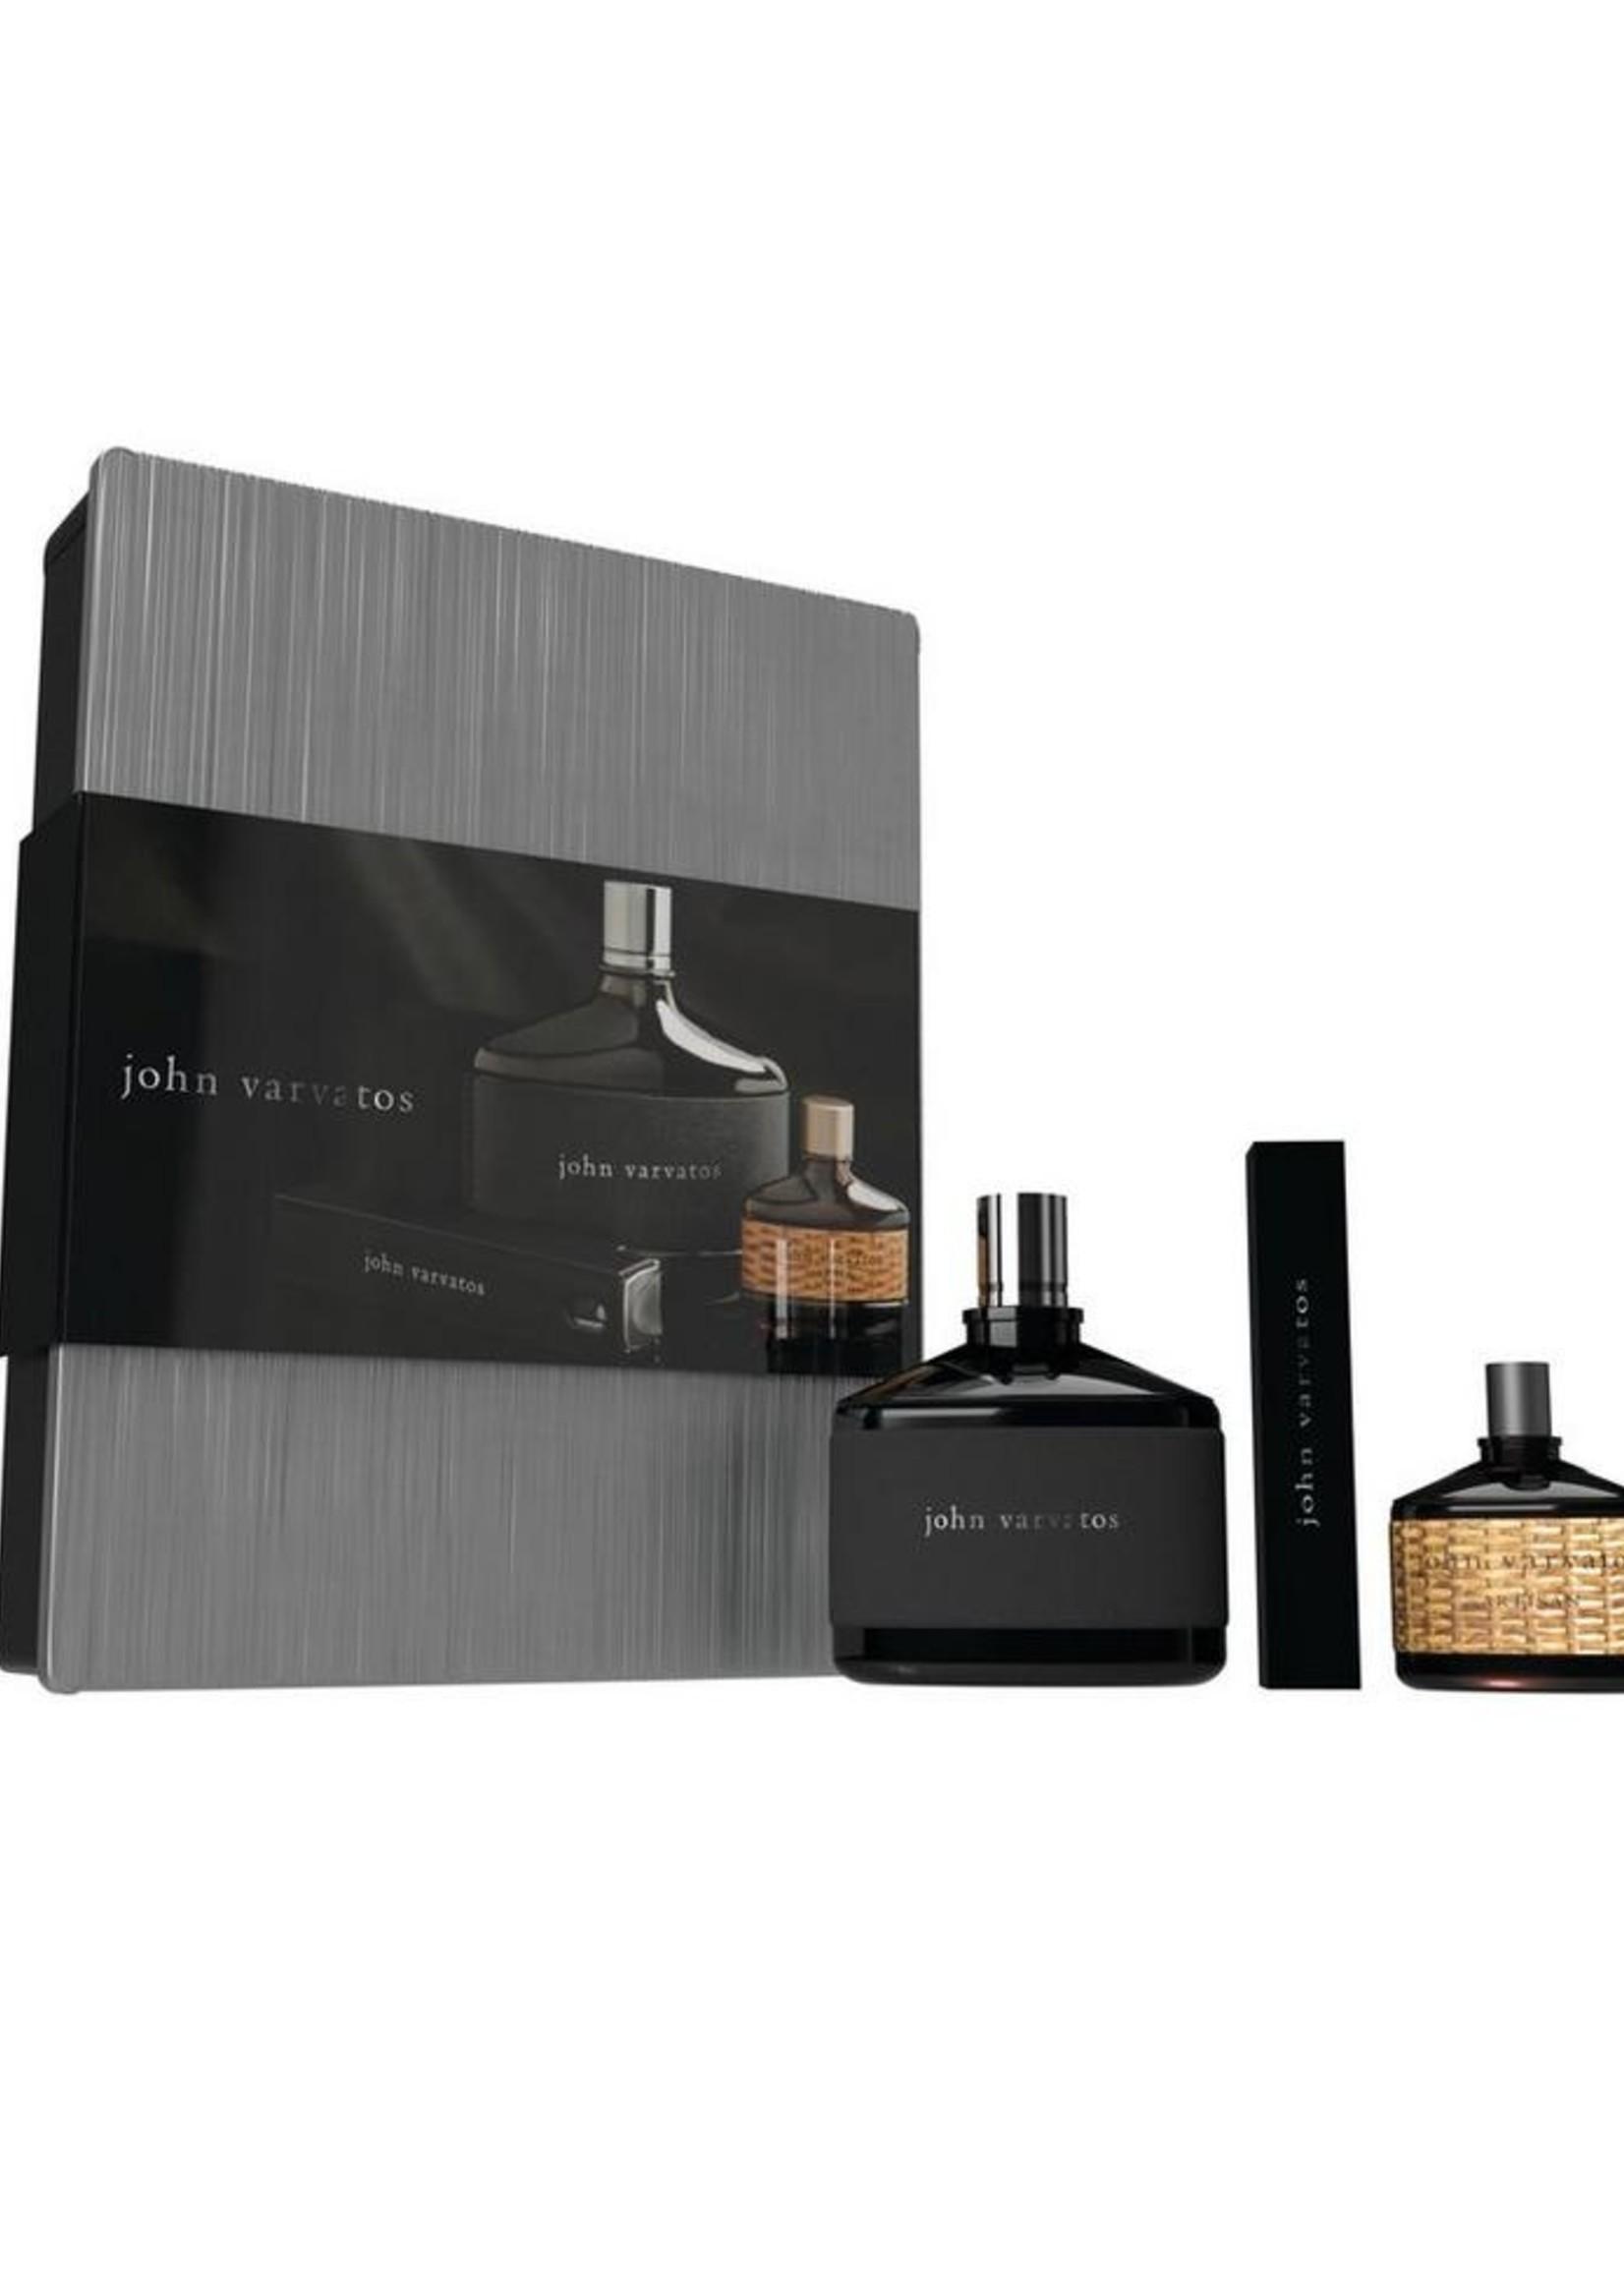 John Varvatos John Varvatos Fragrance Gift Set